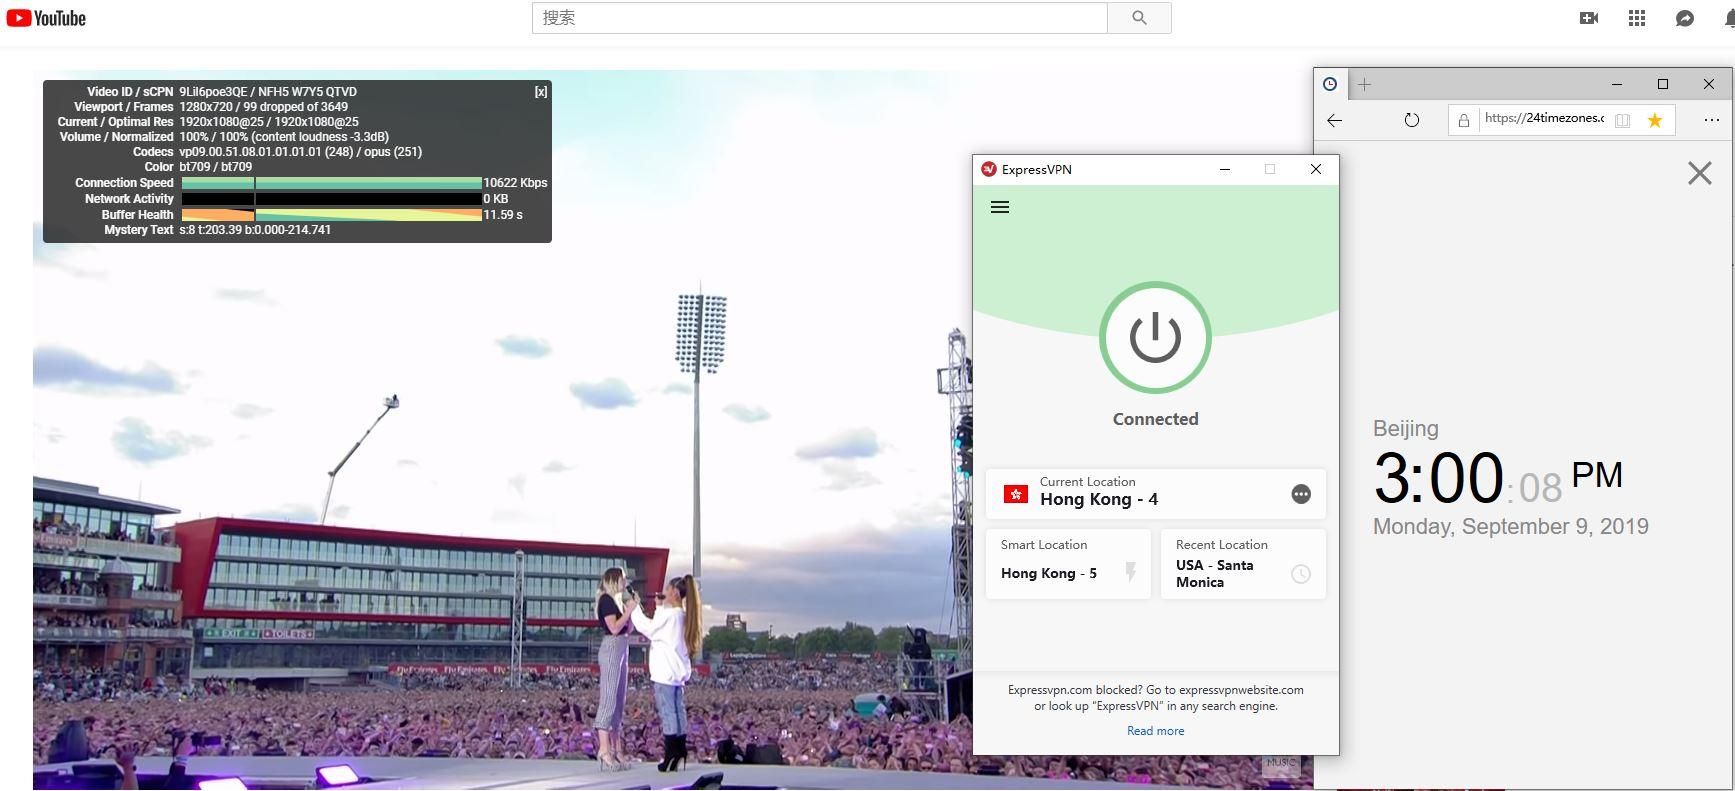 windows ExpressVPN 香港-4 服务器 中国VPN翻墙 科学上网 YouTube速度测试-20190909